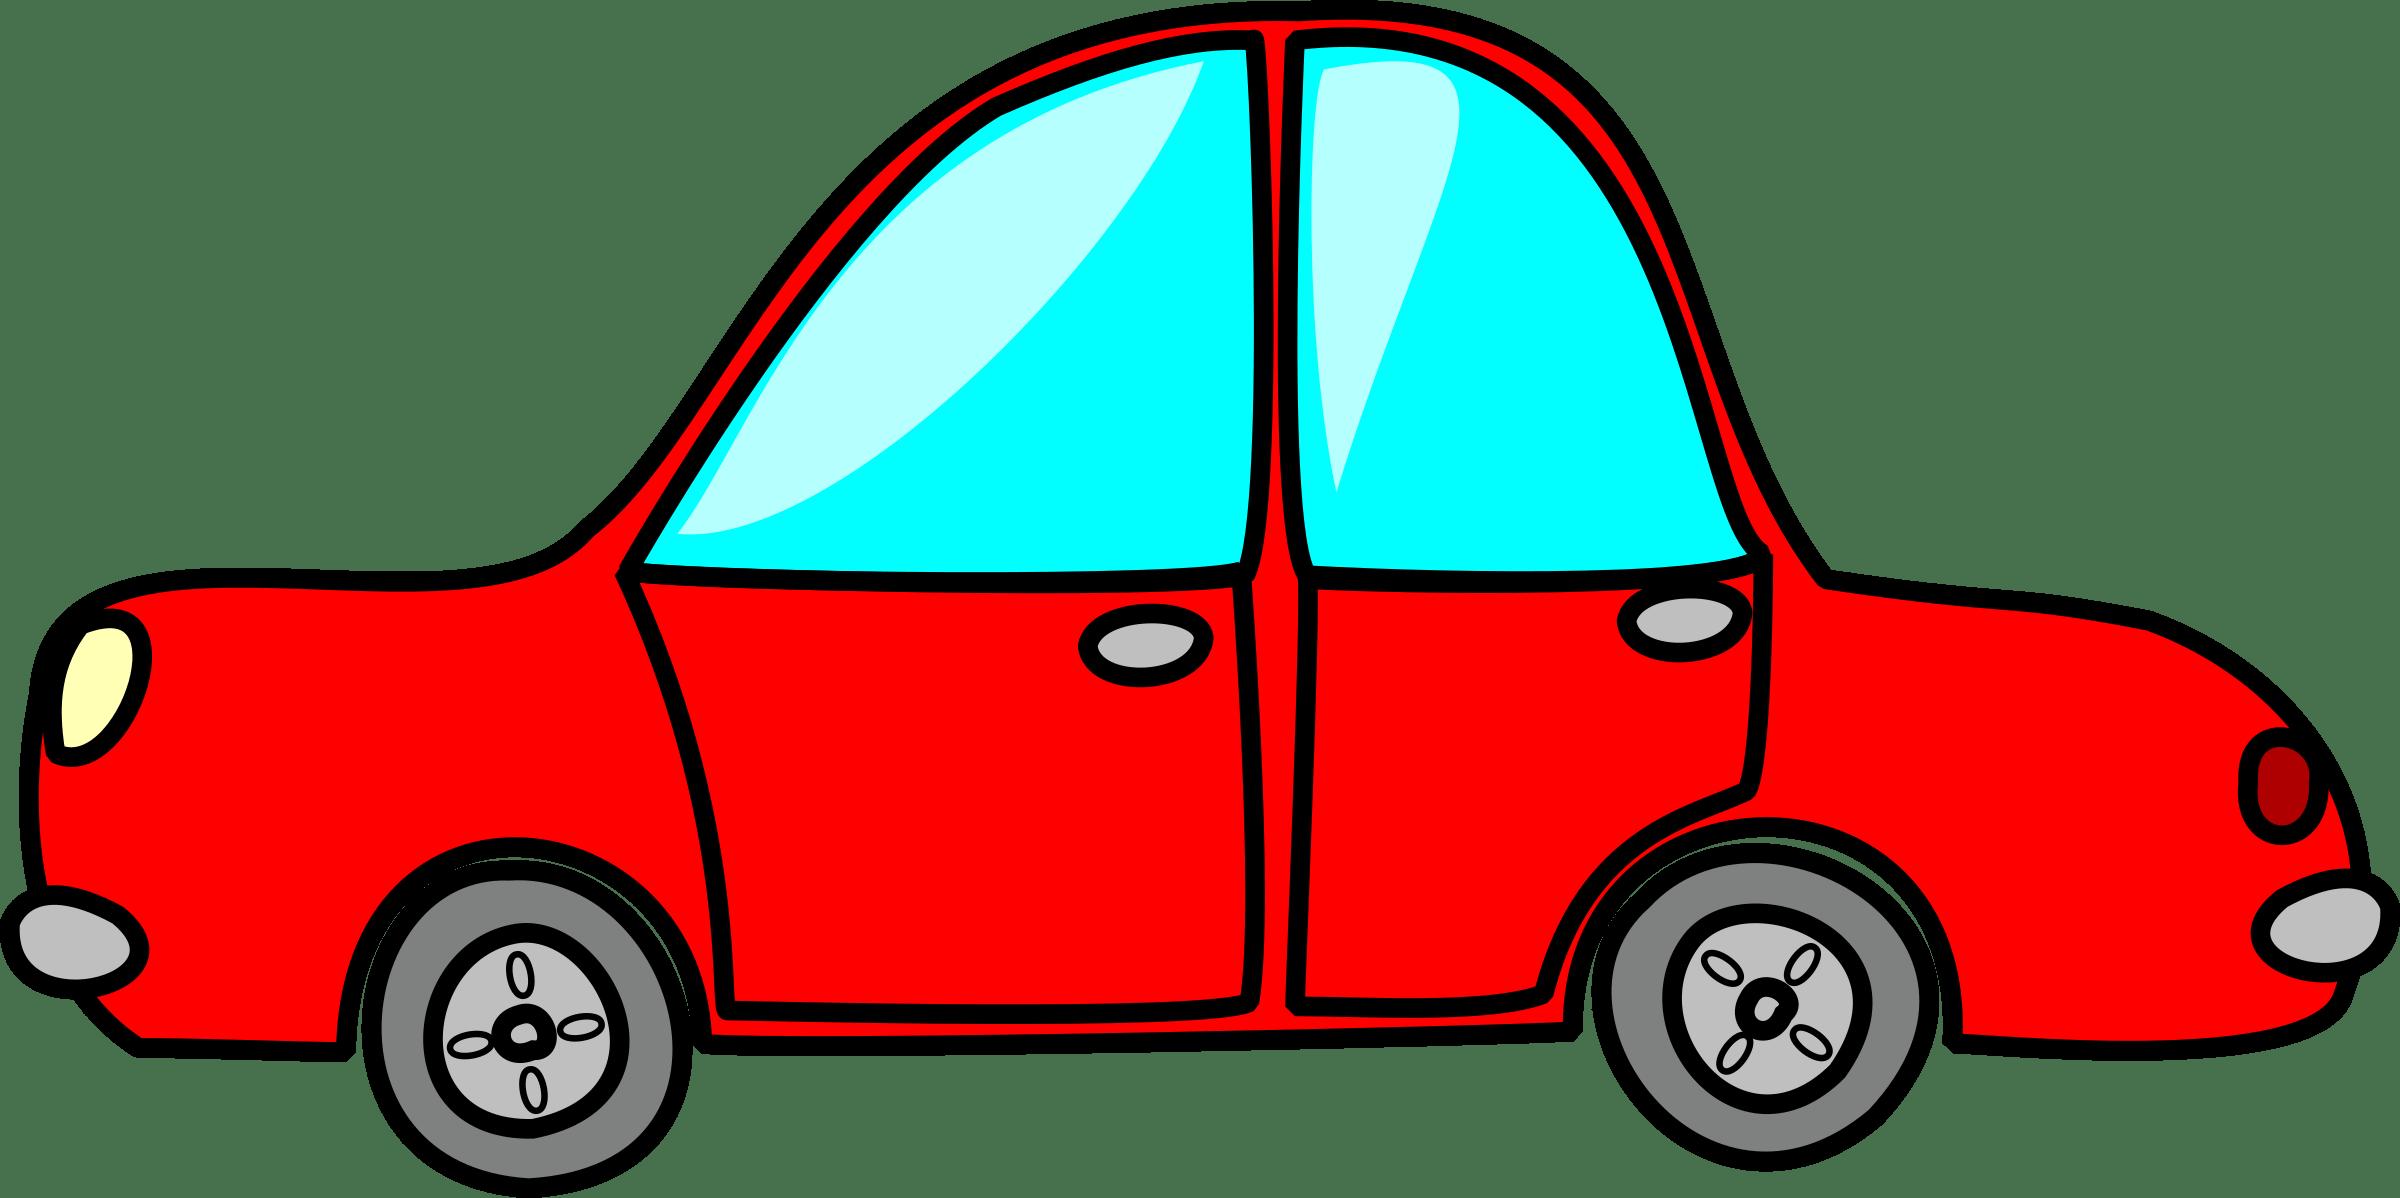 Cartoon Toy Car - ClipArt Best (2400 x 1198 Pixel)